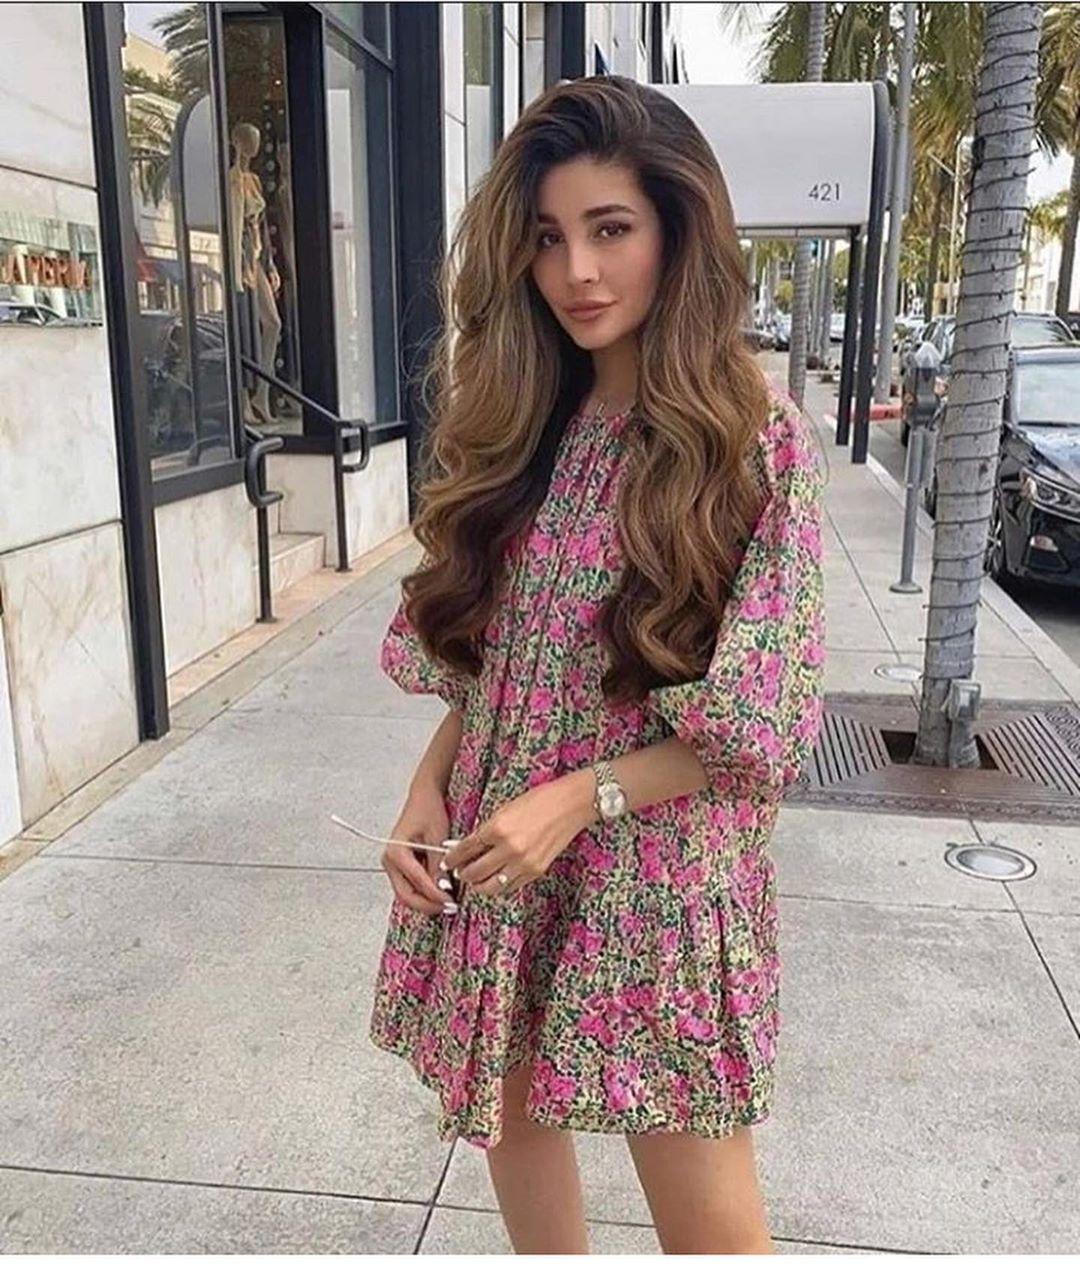 volume printed dress de Zara sur look_by_zara_hm